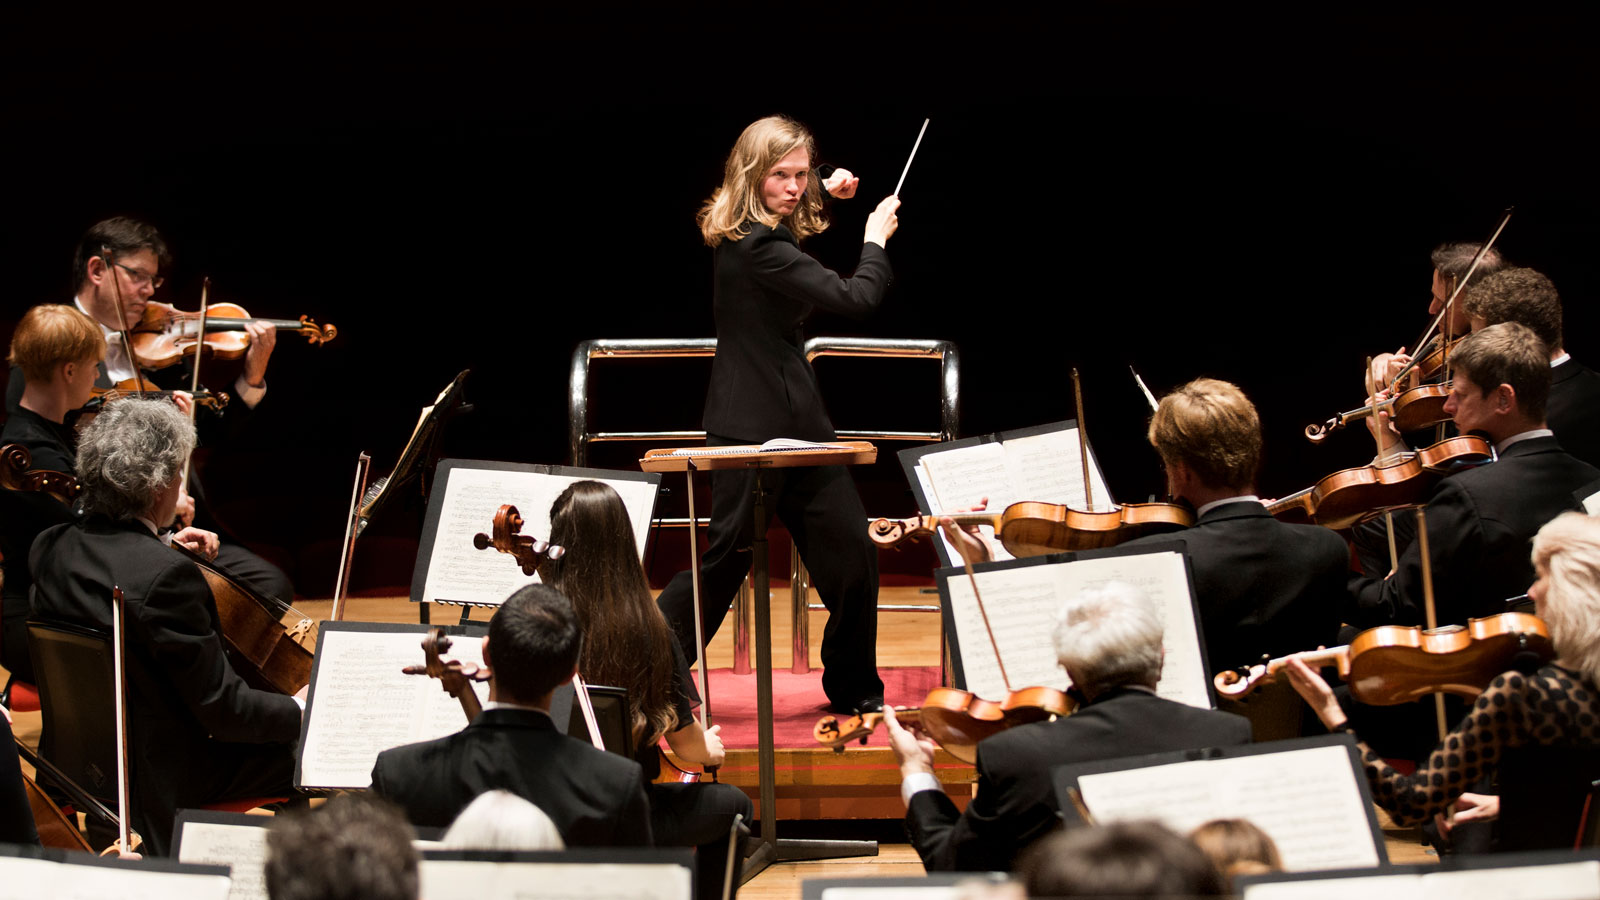 City of Birmingham Orchestra